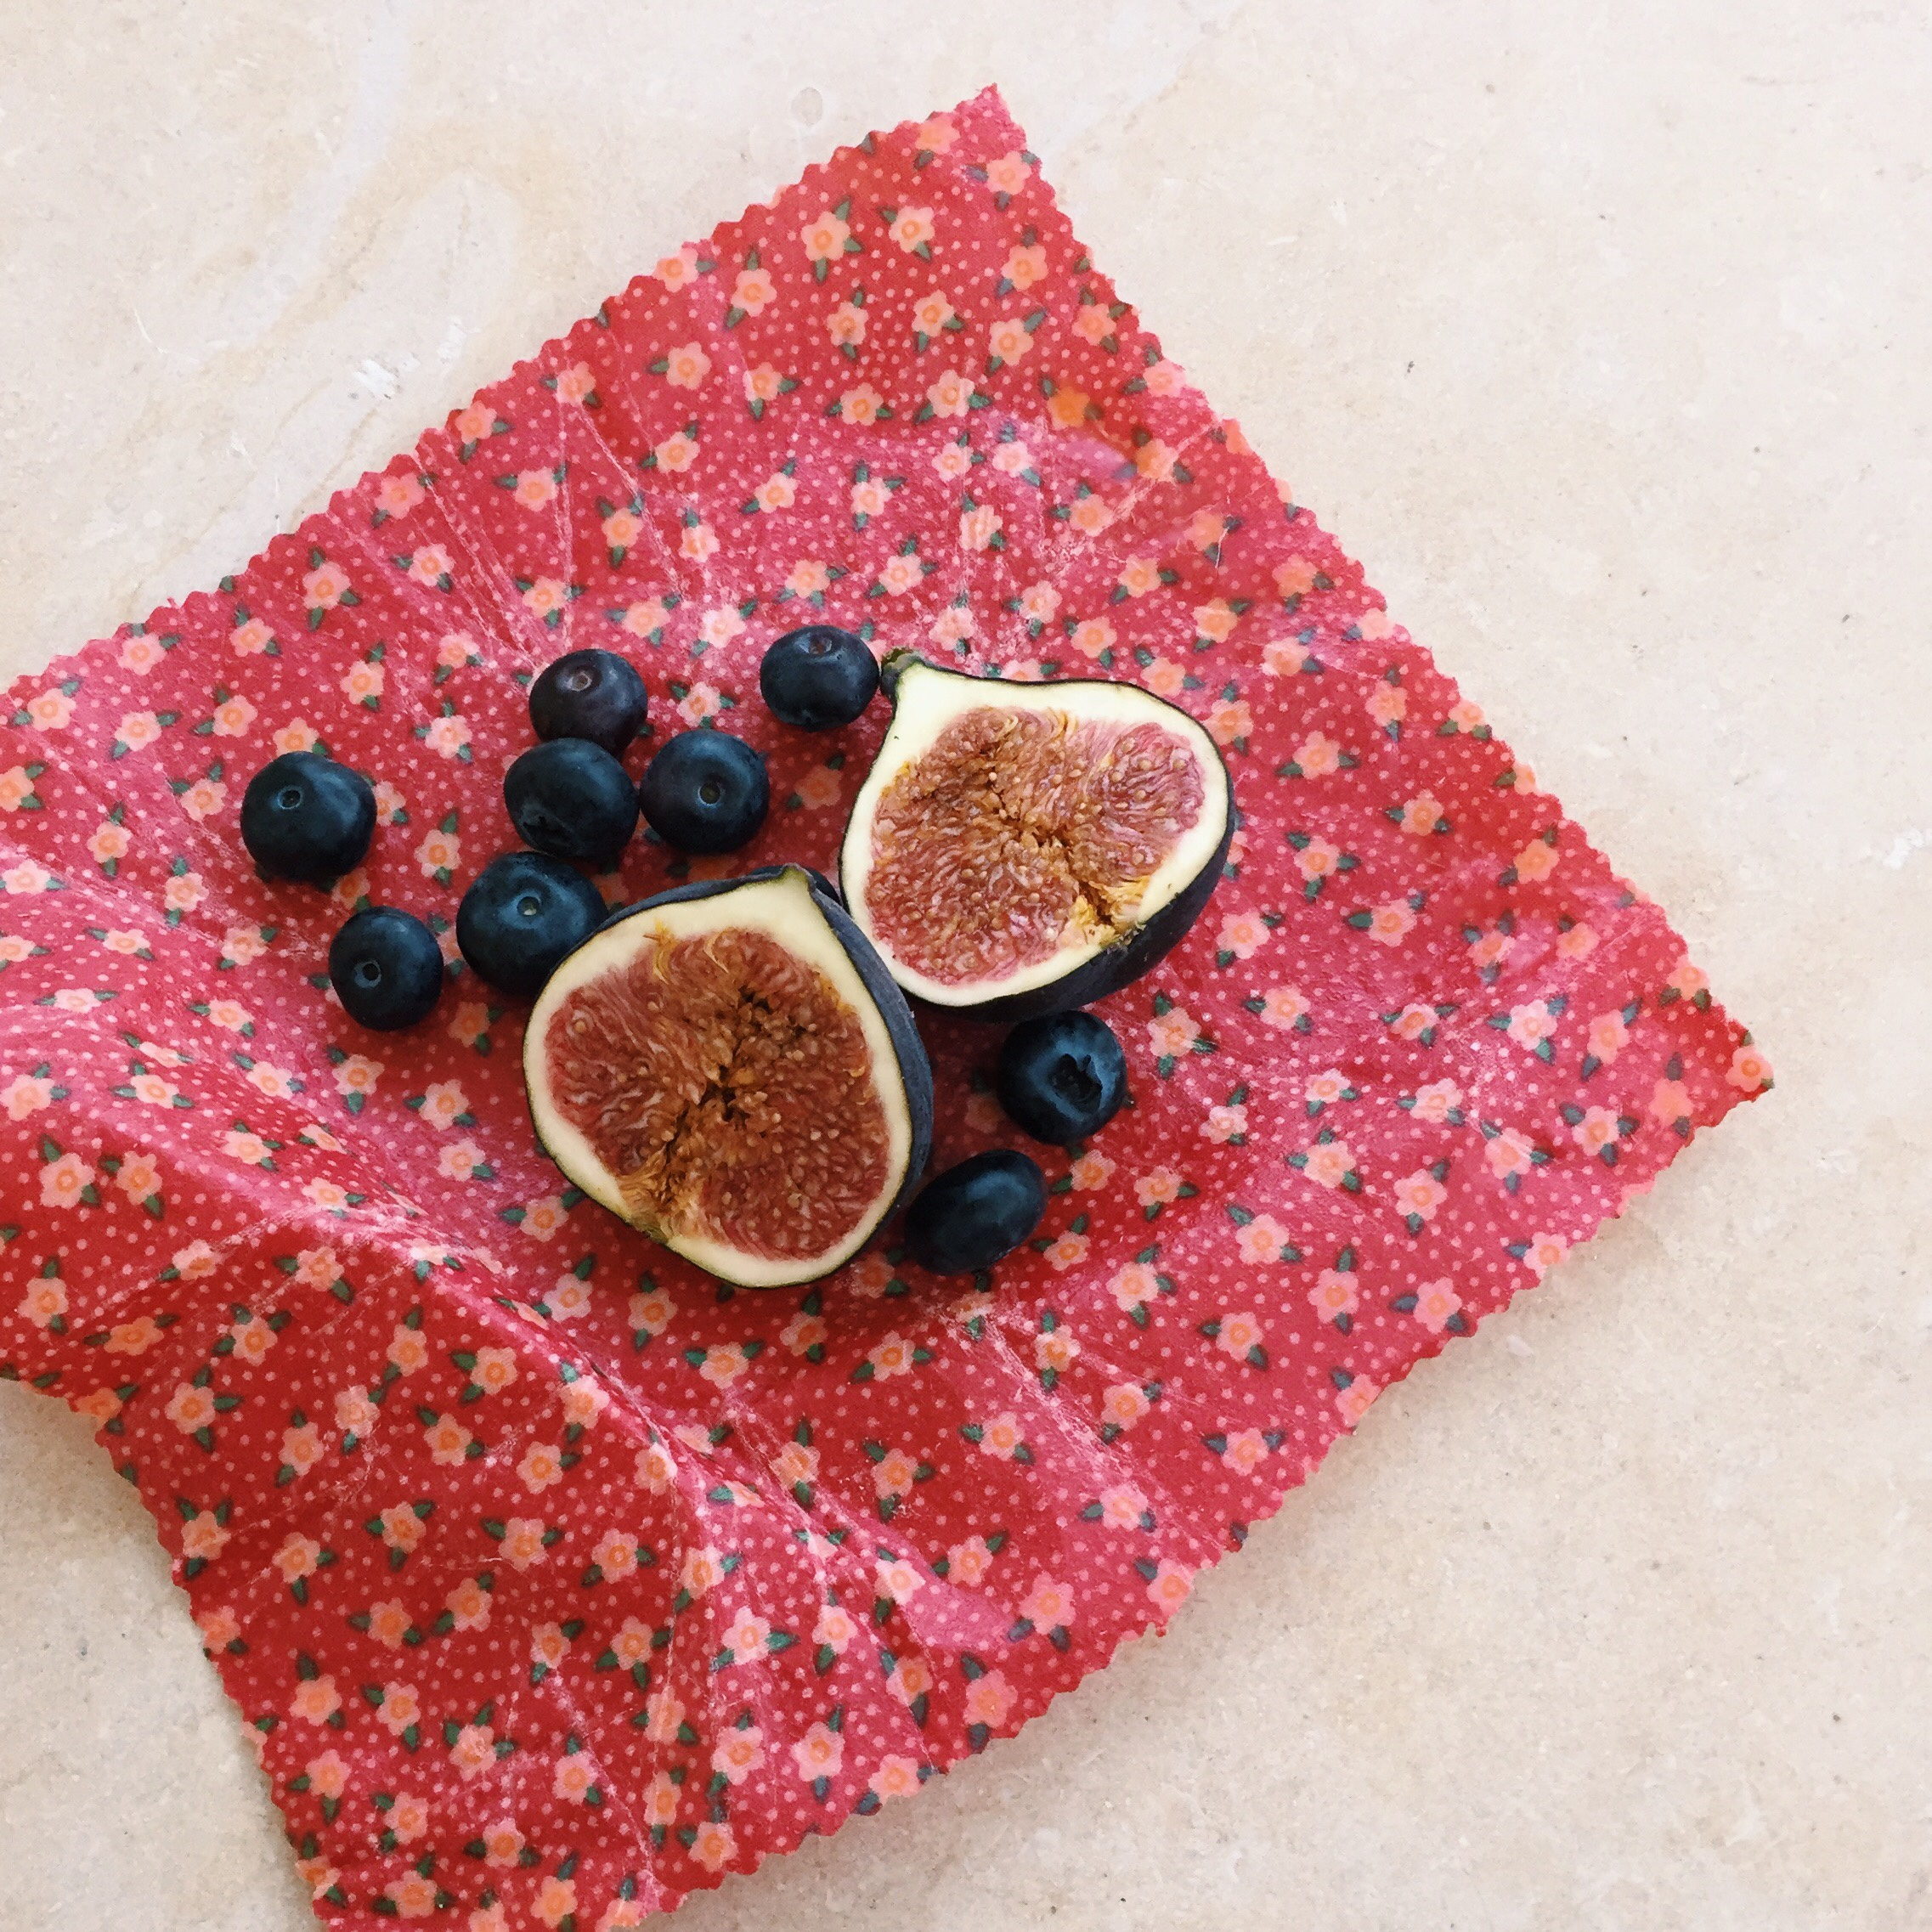 Homemade Beeswax Wraps